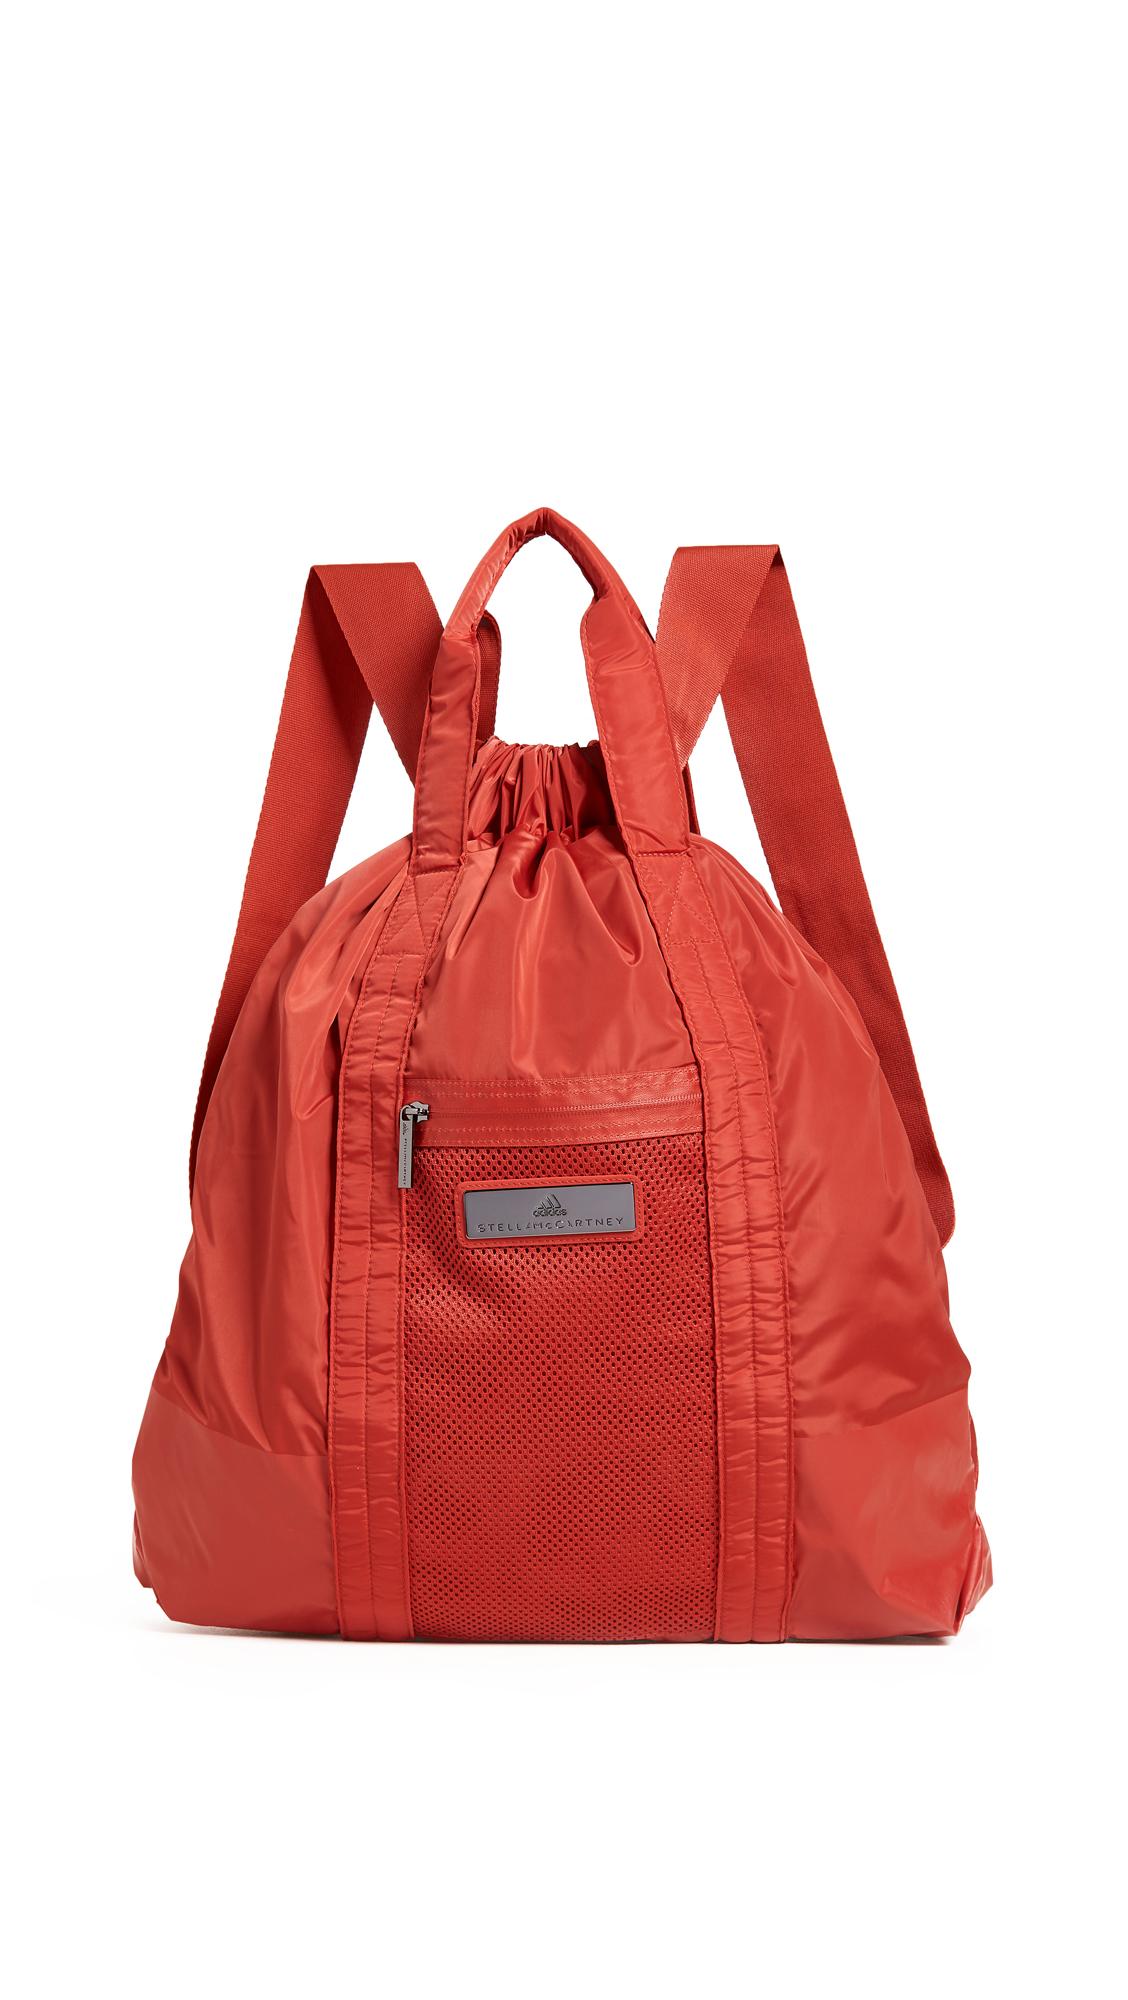 adidas by Stella McCartney Gym Sack Backpack